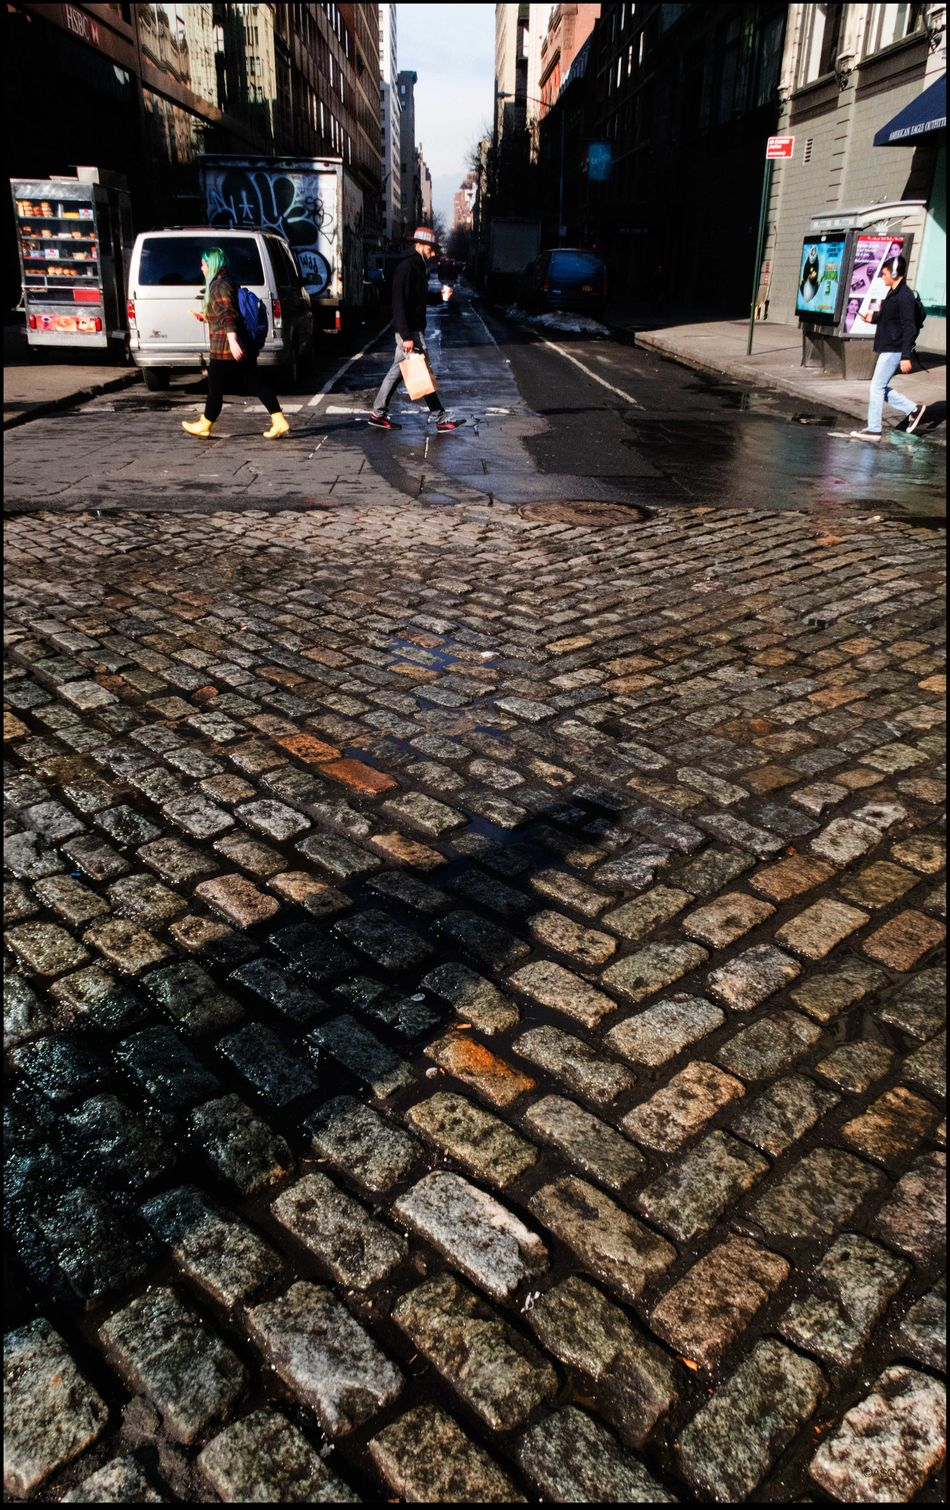 Walking on Cobblestones - 2/1/16 Cobblestone Man's Shadow Pattern People Walking  Street Photography NYC Street Vender Wet Streets